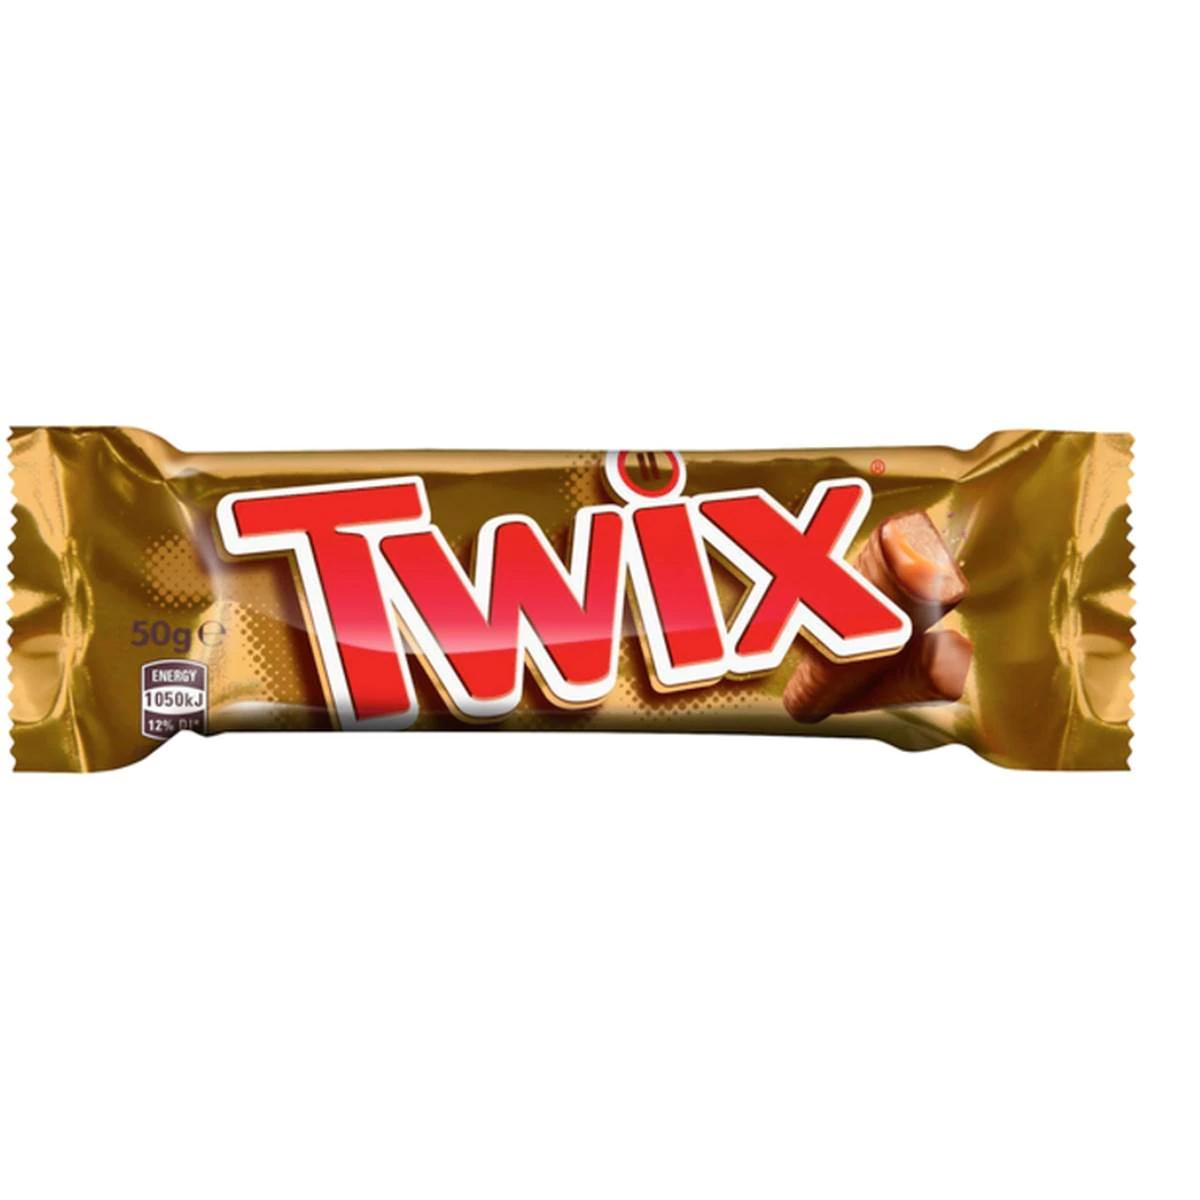 Twix - 5×2 for 99p @ Sam 99p Store